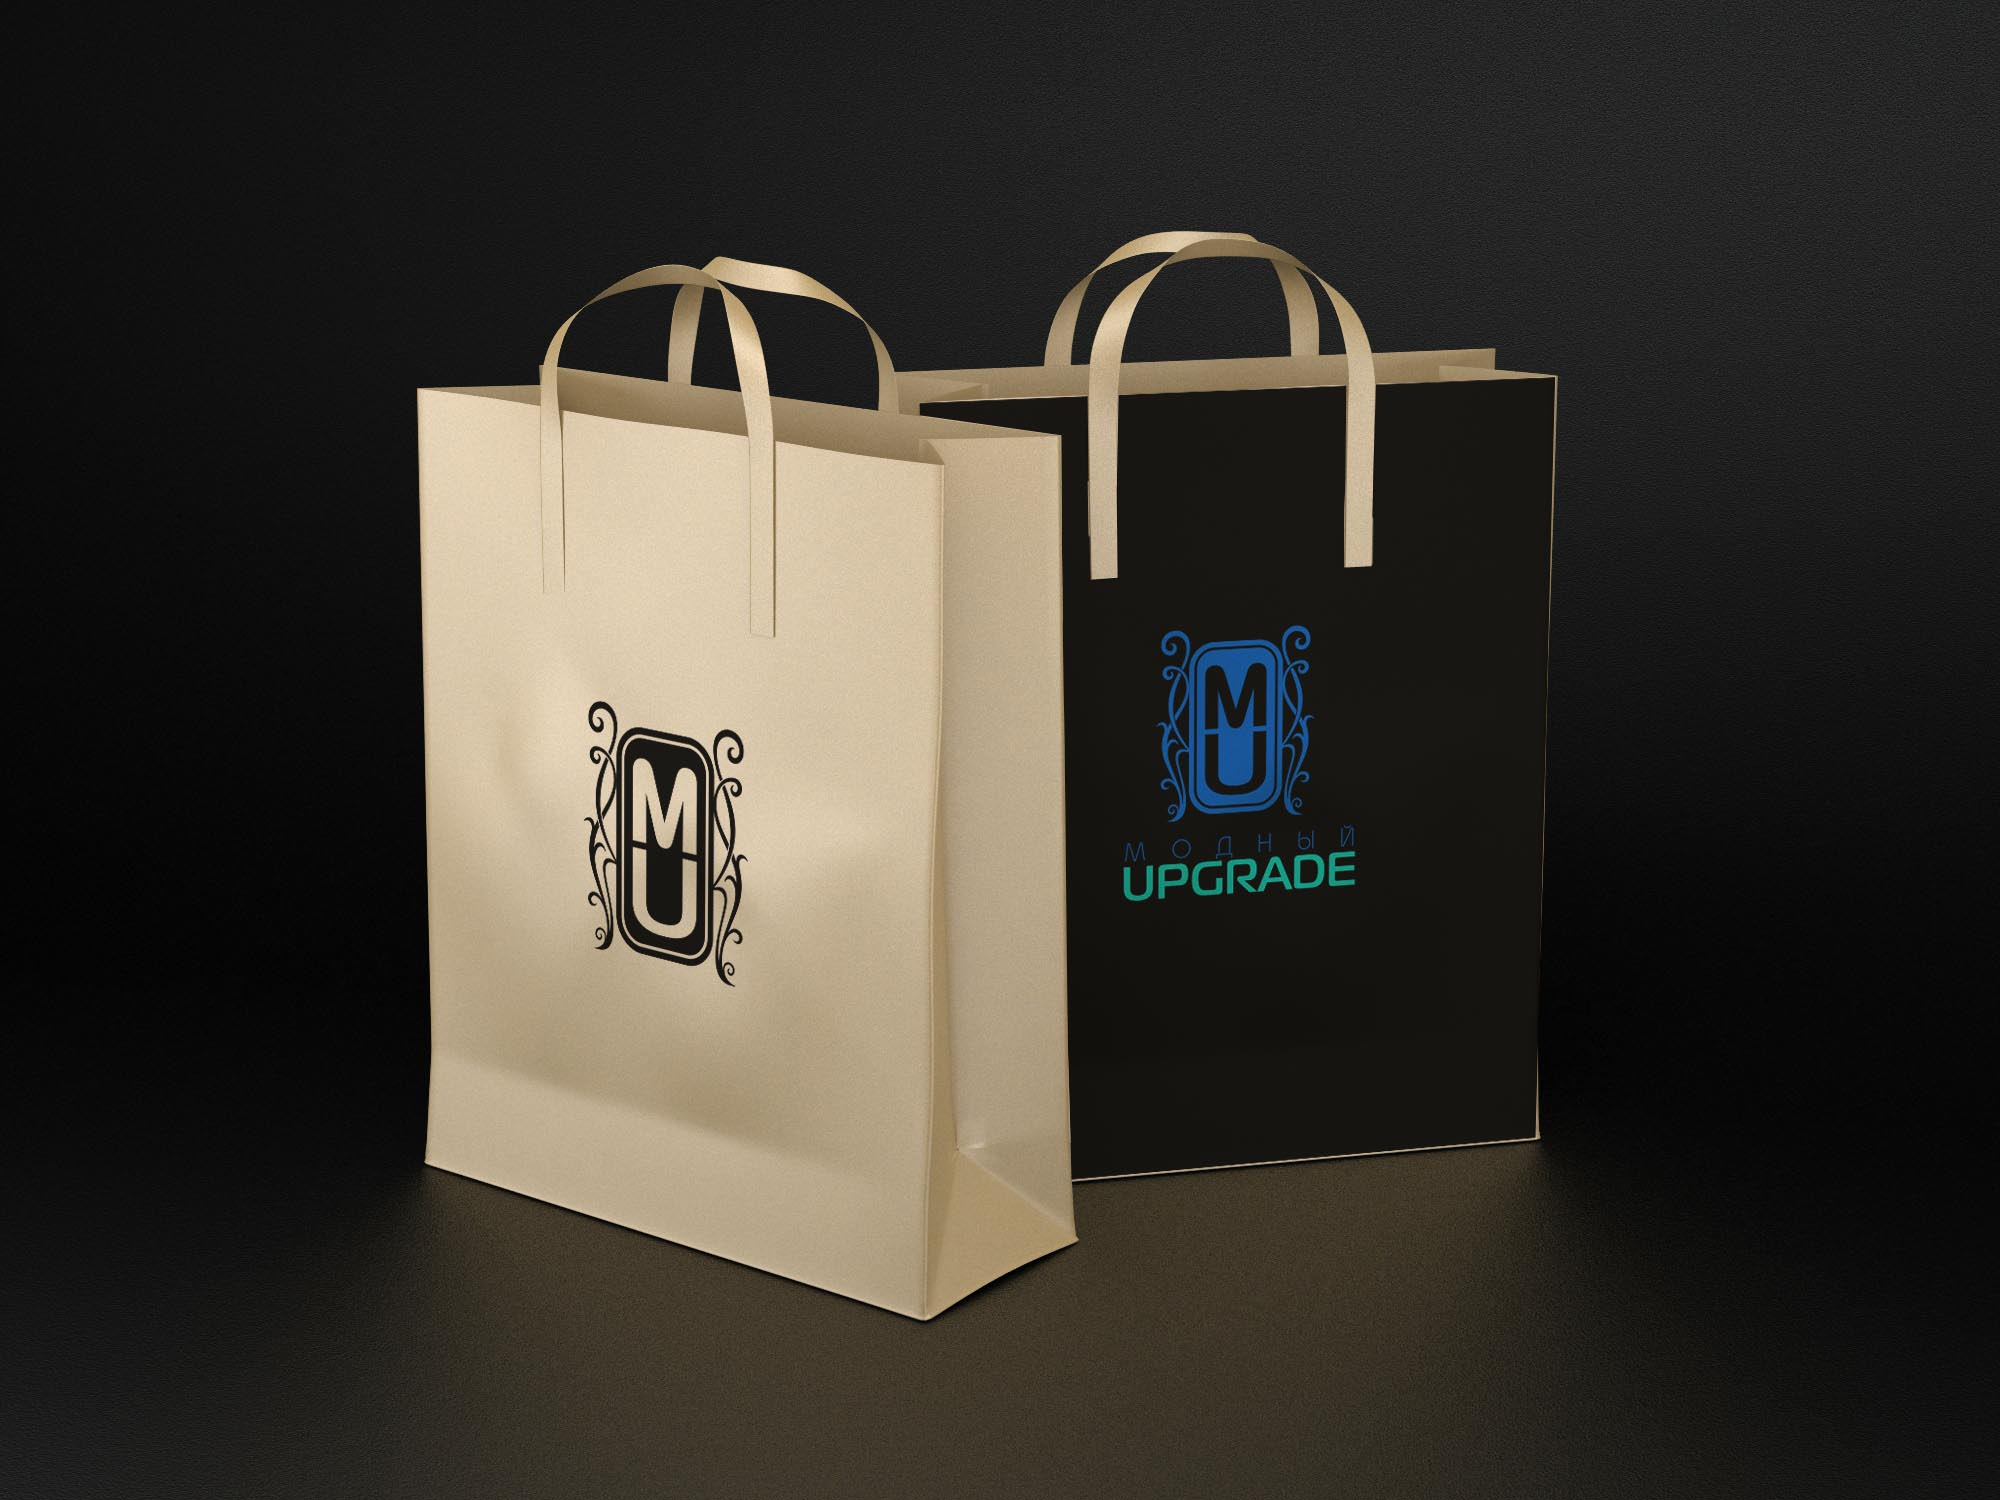 "Логотип интернет магазина ""Модный UPGRADE"" фото f_6025943ddb625801.jpg"